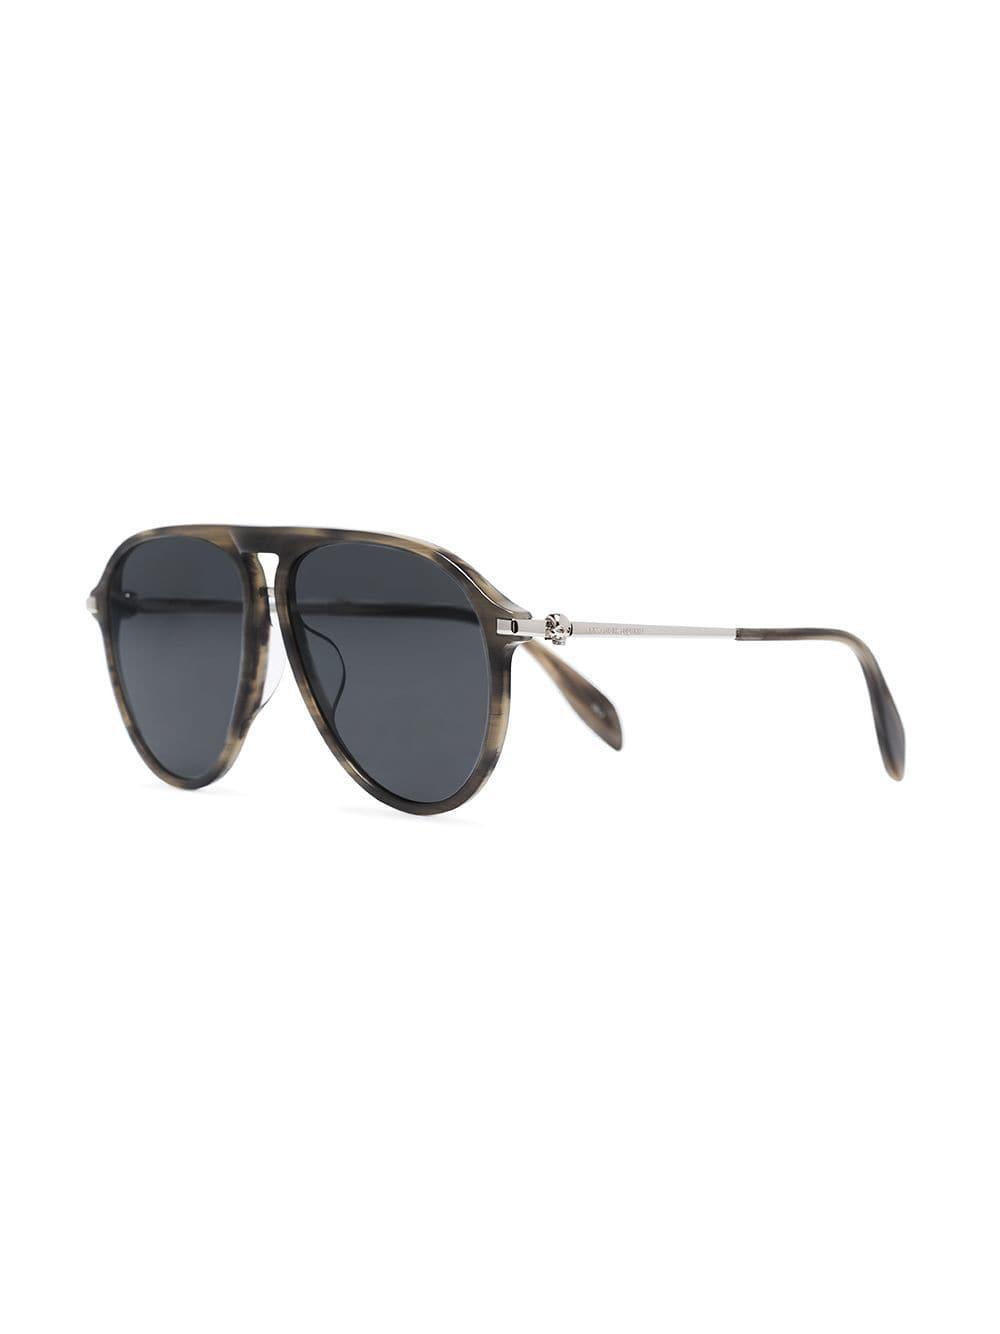 a056aa9d9a1 Alexander Mcqueen Brown Aviator Sunglasses in Metallic for Men - Save  4.129263913824062% - Lyst